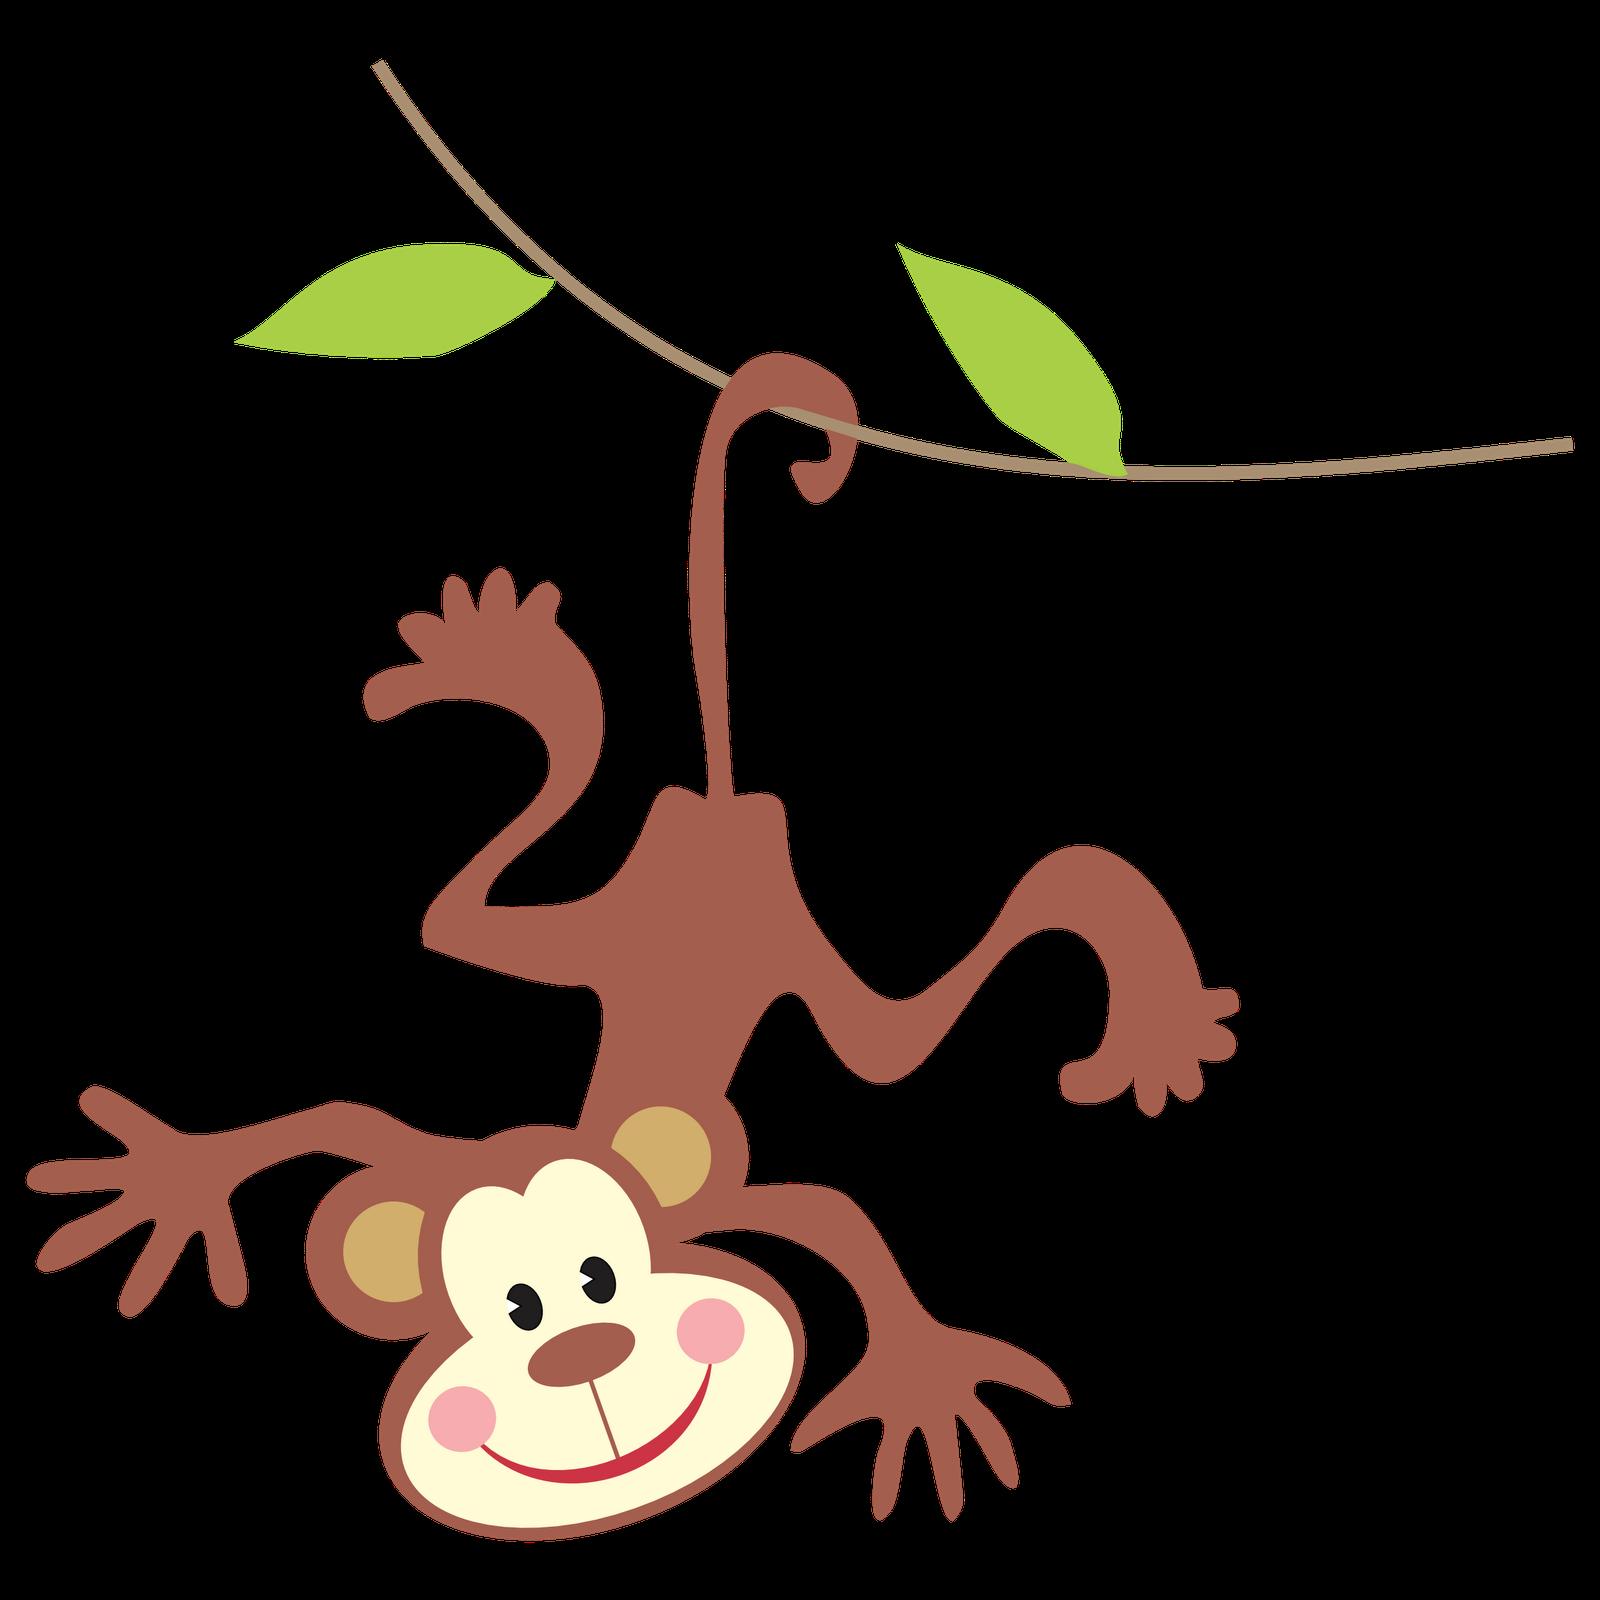 monkey clipart cheeky monkey